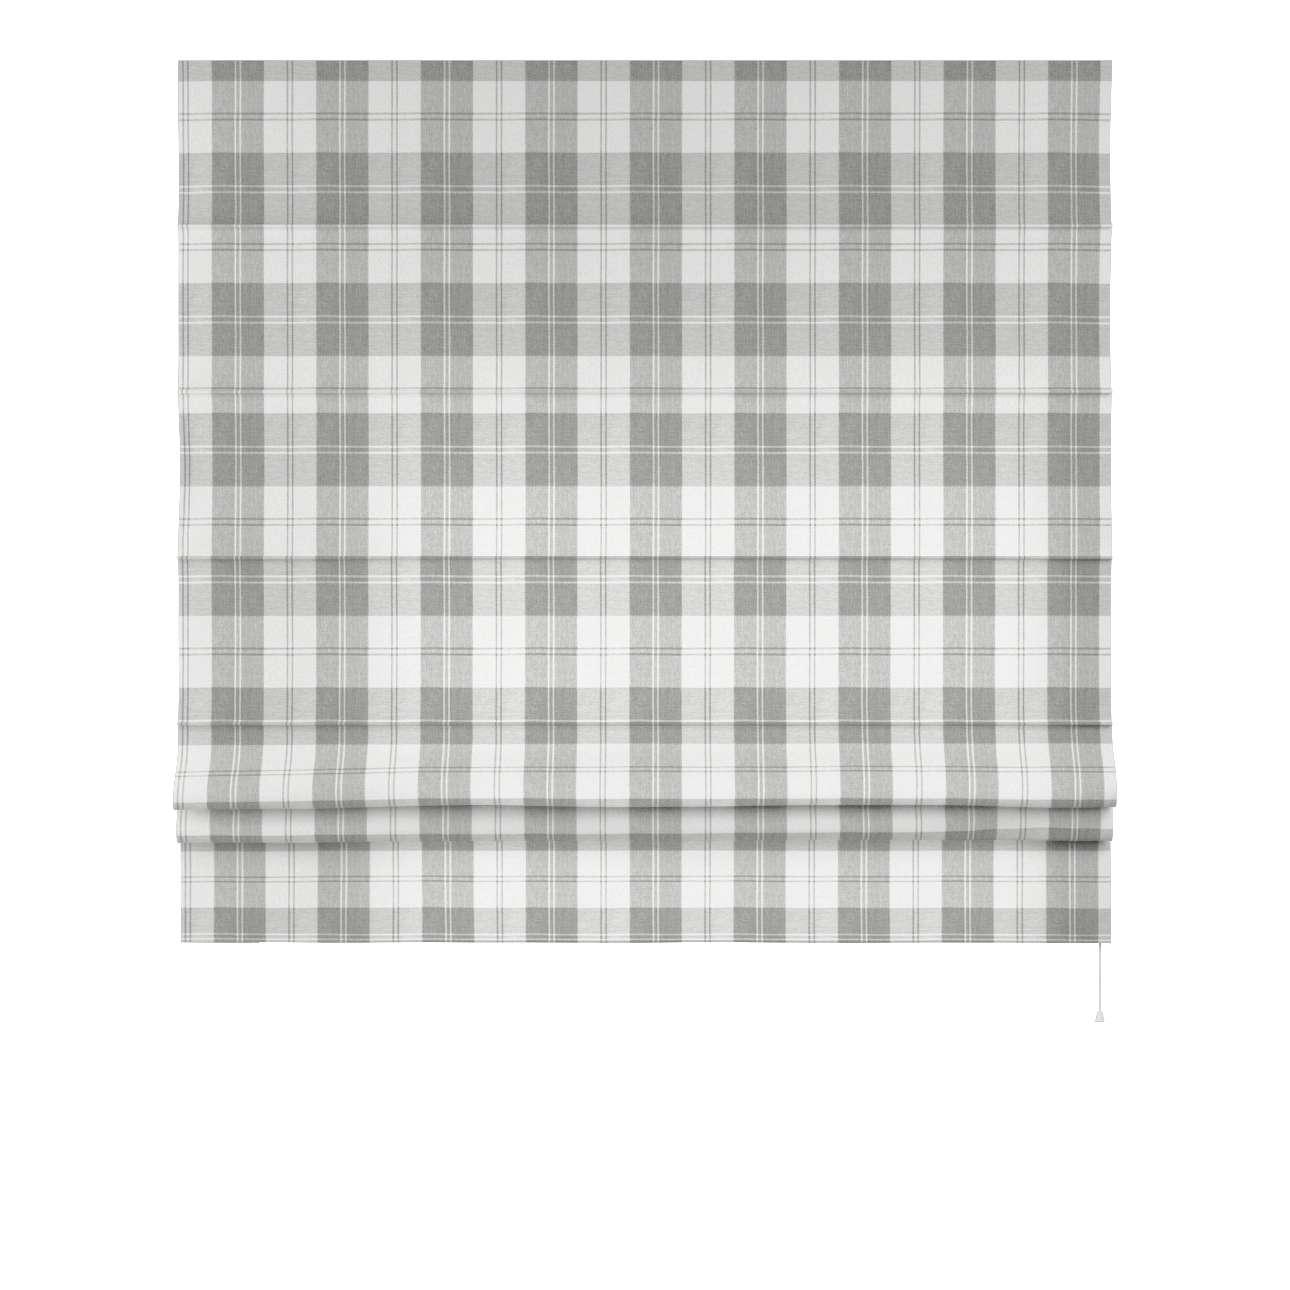 Foldegardin Paris<br/>Med lige flæse 80 × 170 cm fra kollektionen Edinburgh, Stof: 115-79